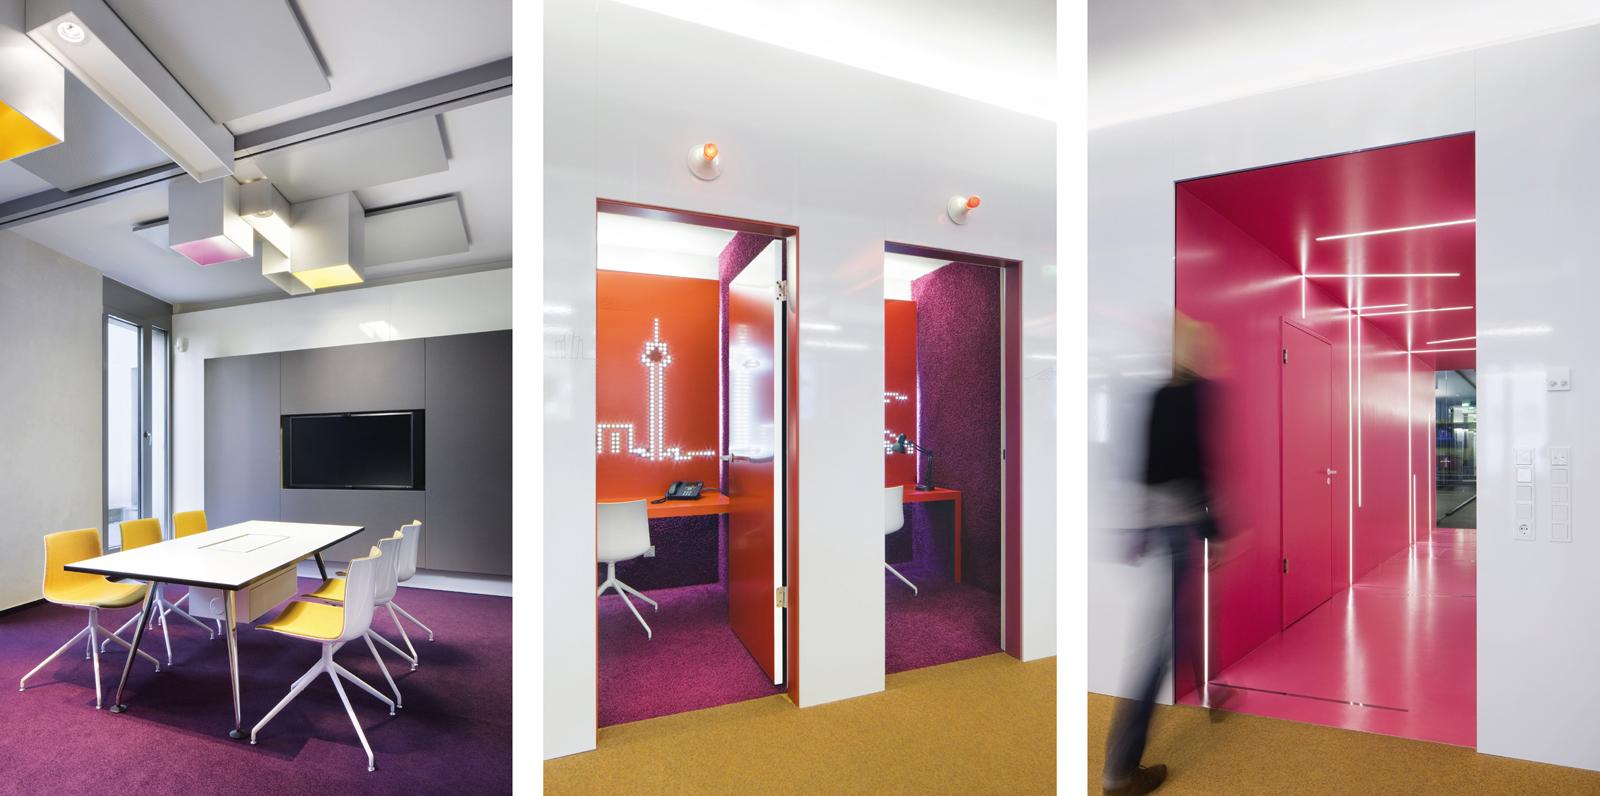 Innenarchitektur Köln lepel lepel architektur innenarchitektur köln office